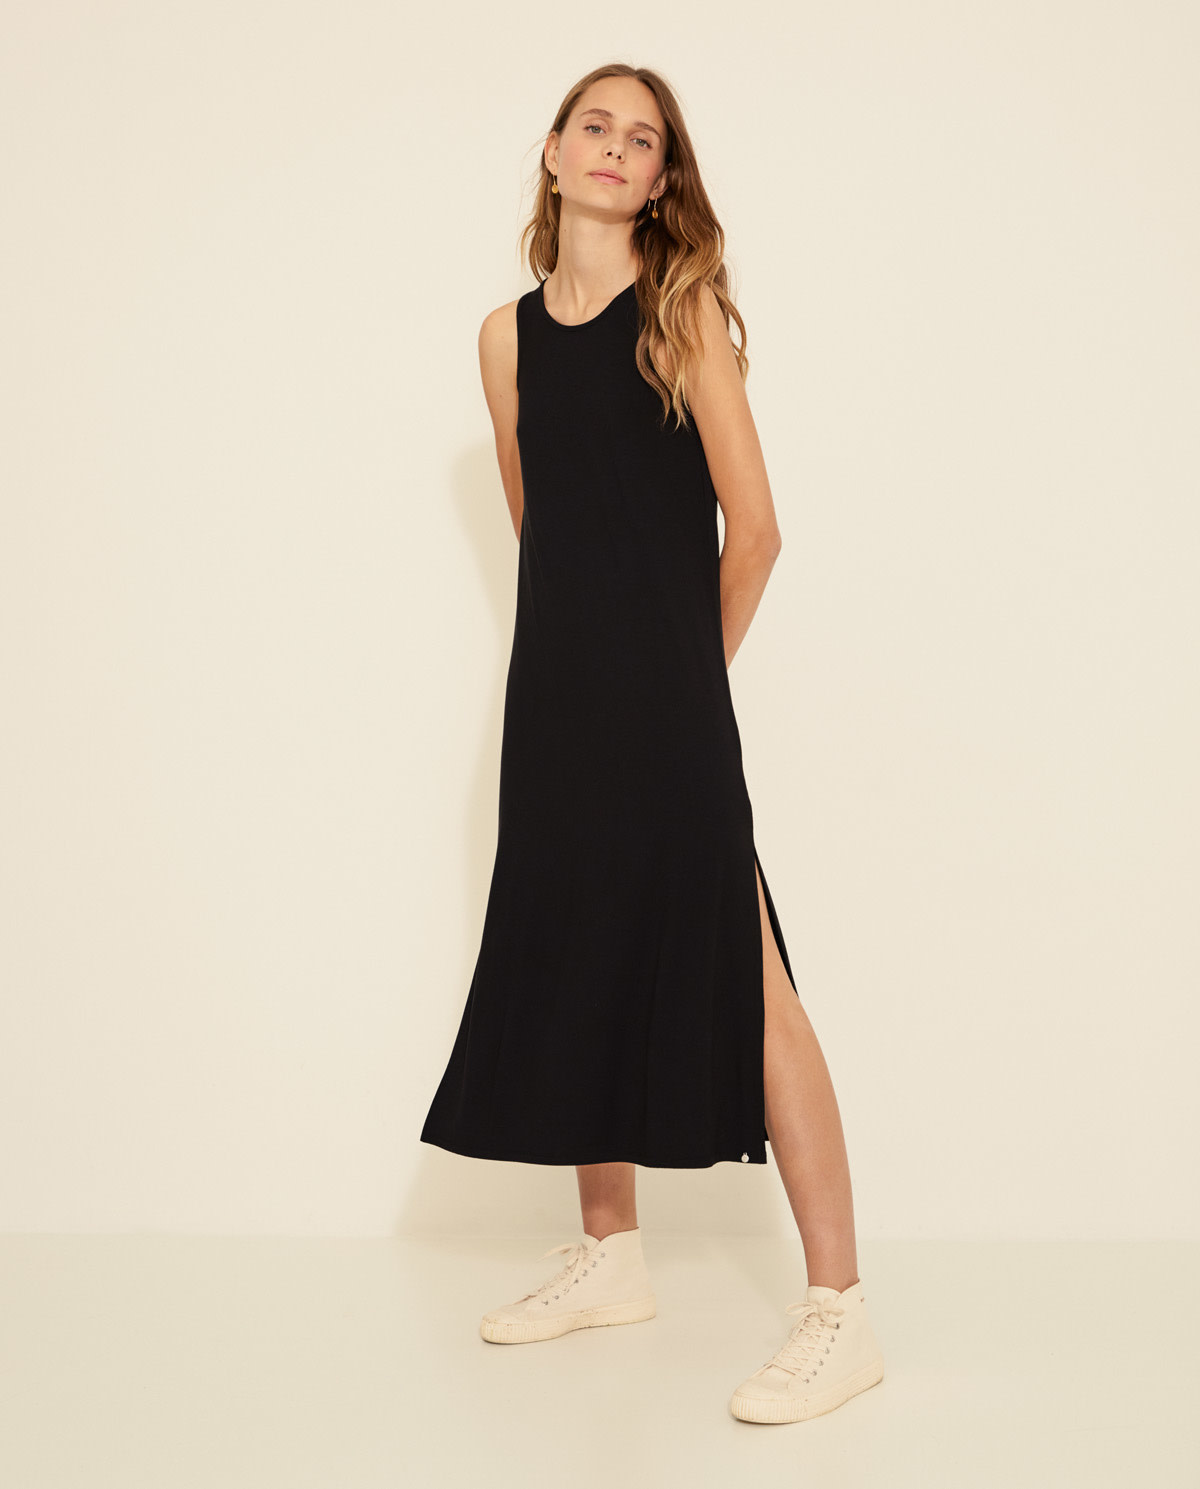 Yerse Alyssa Dress